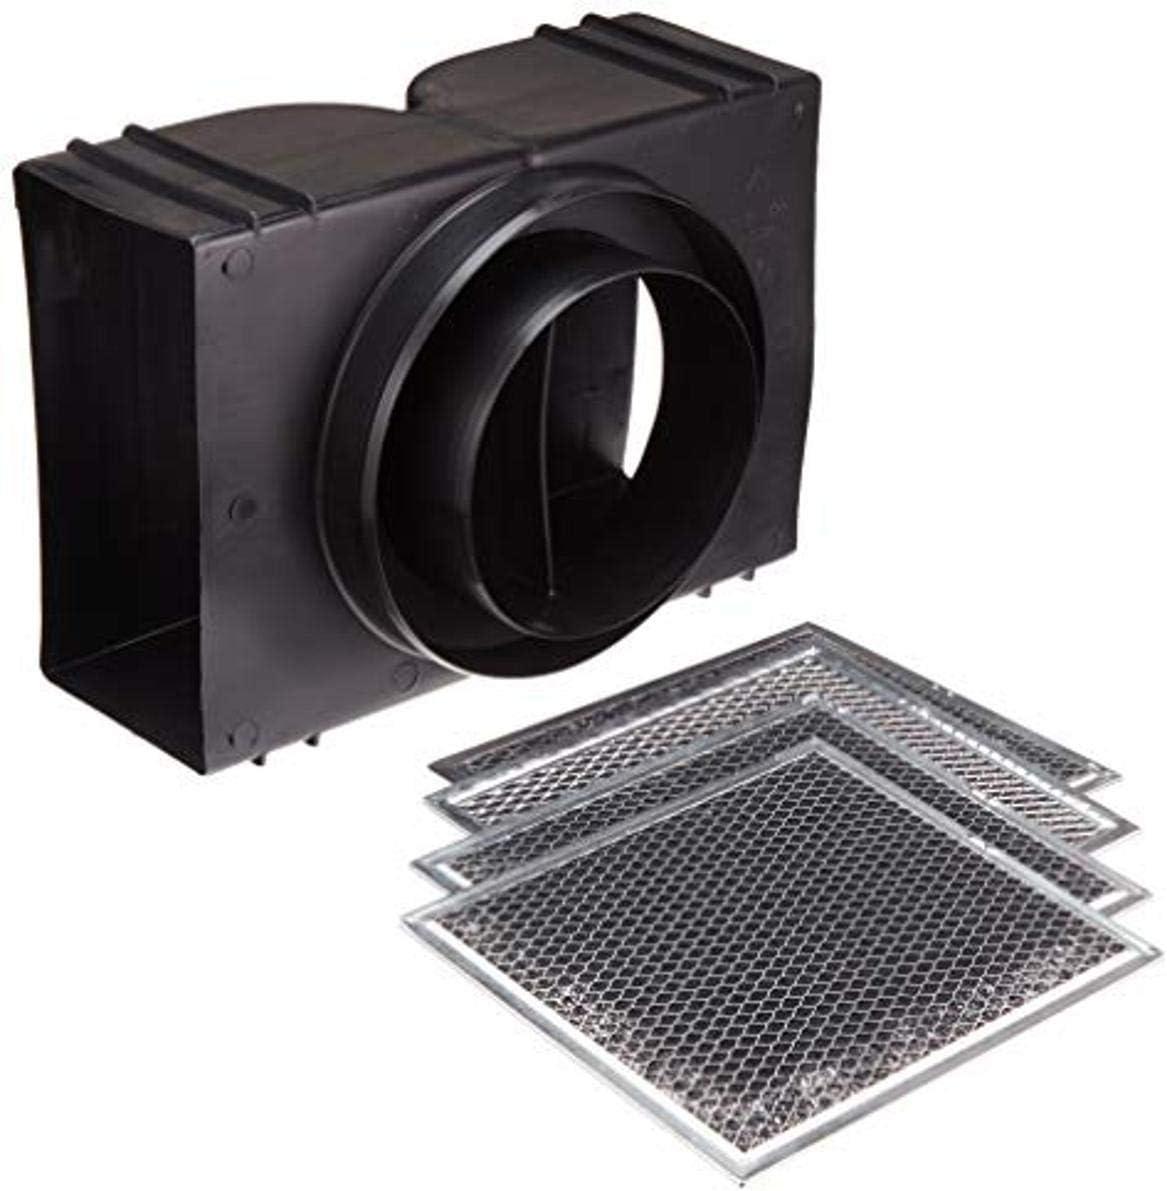 Appliances Range Hoods Whirlpool W10692909 Range Hood ...